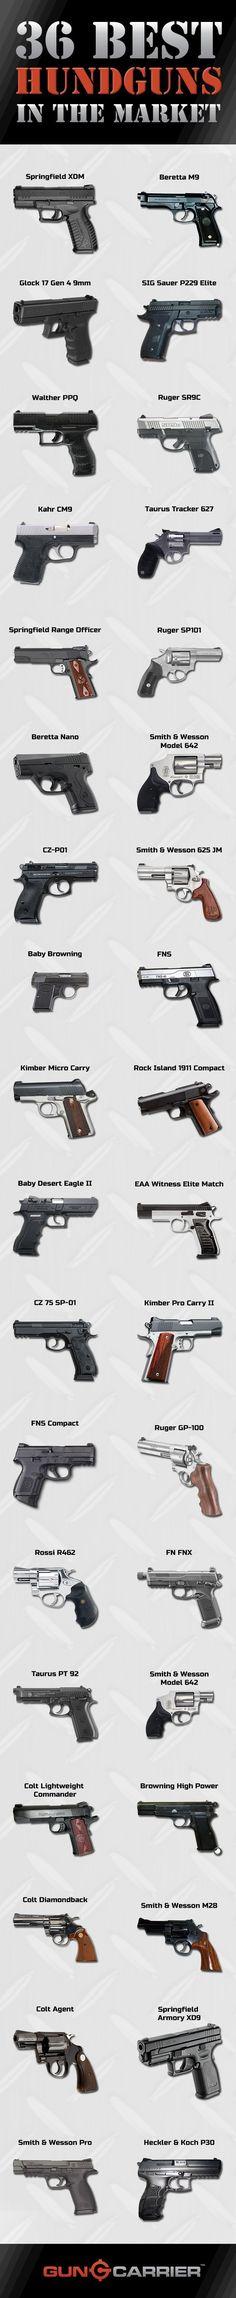 36 Best Handguns You Will Ever Need | https://guncarrier.com/best-handguns/ #reload #reloadammunition #leeprecision #recargamuniciones #municiones